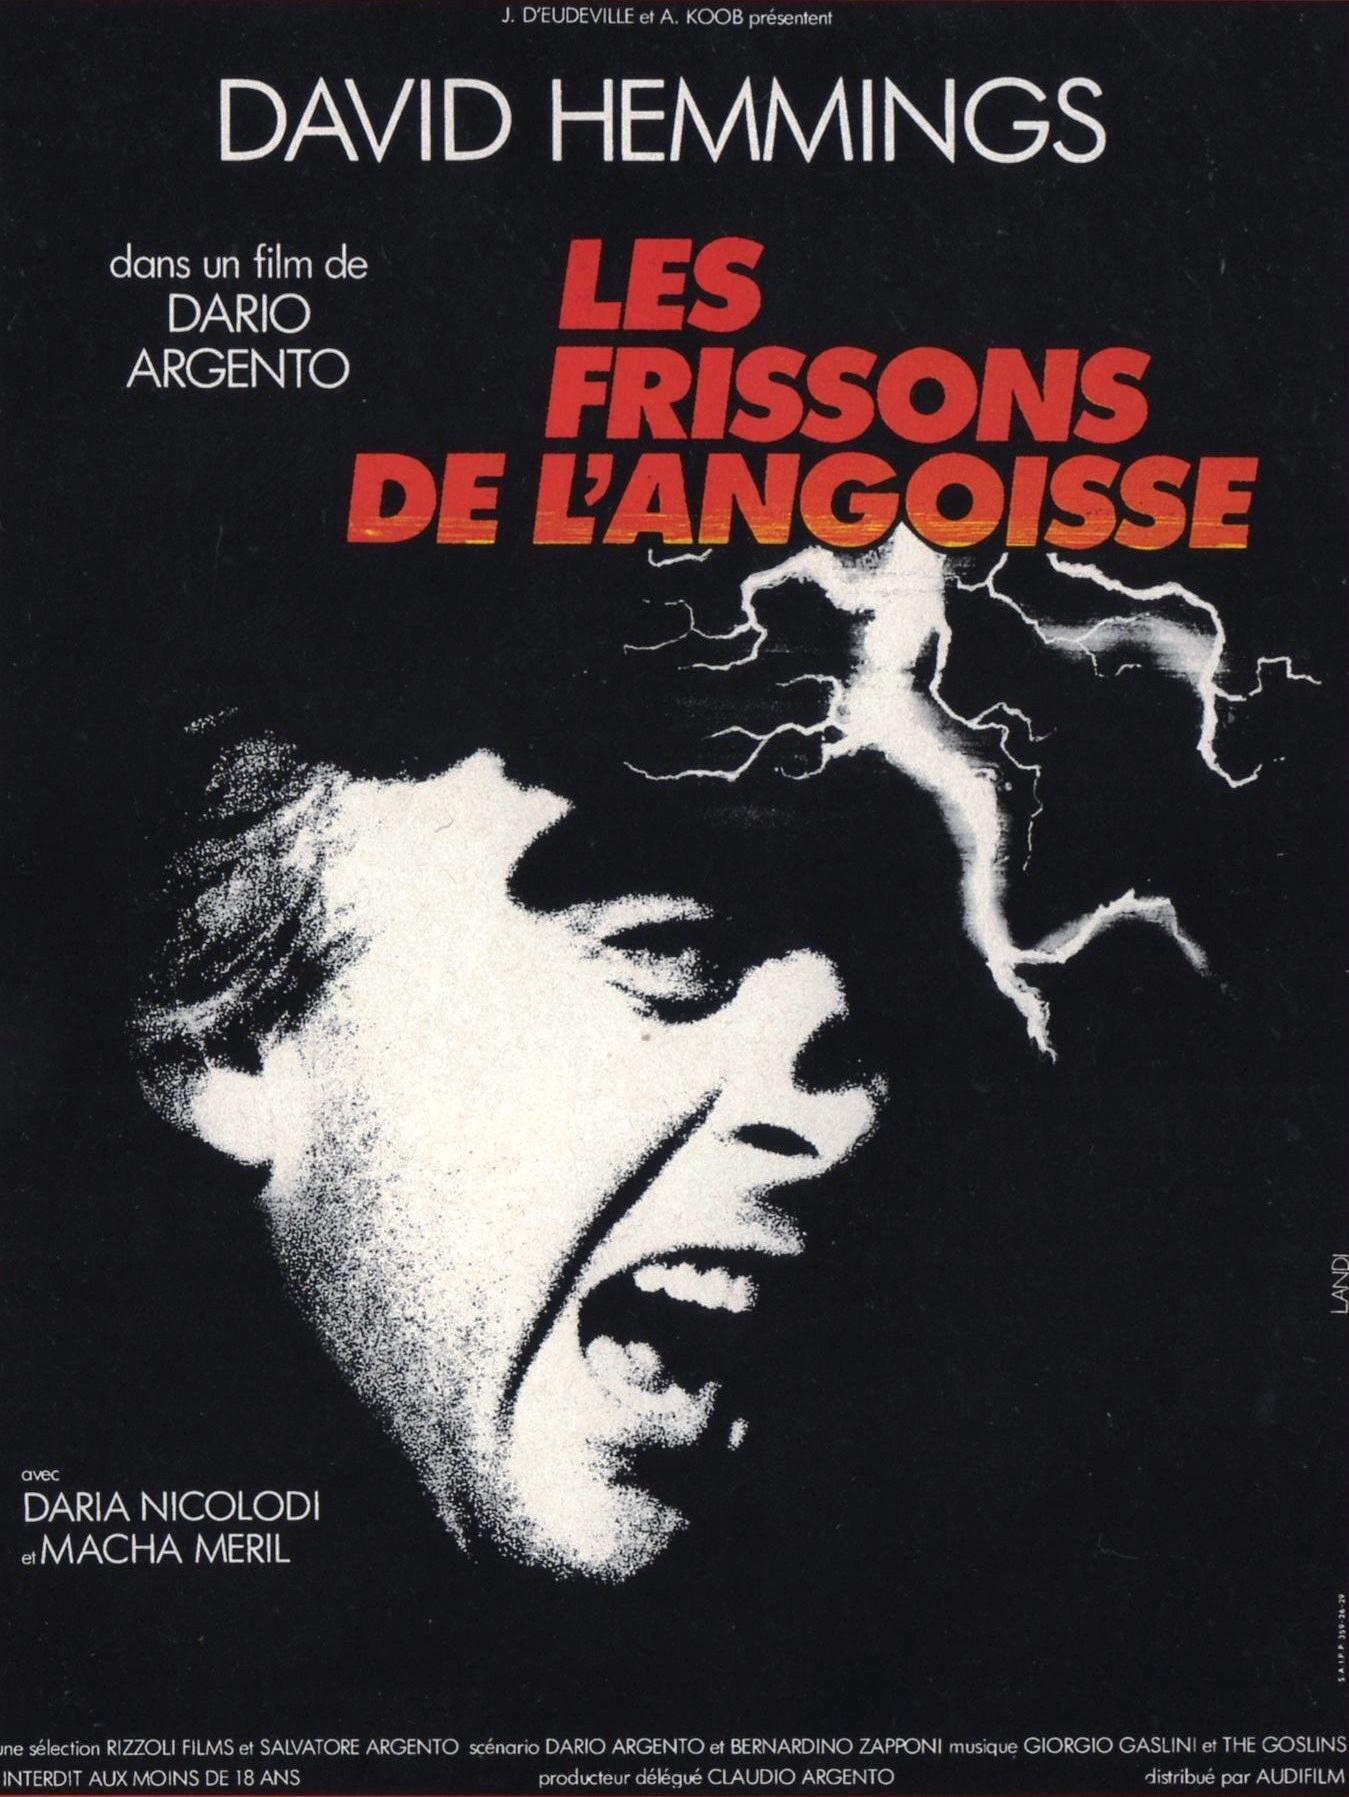 LES FRISSONS DE L'ANGOISSE de Dario Argento